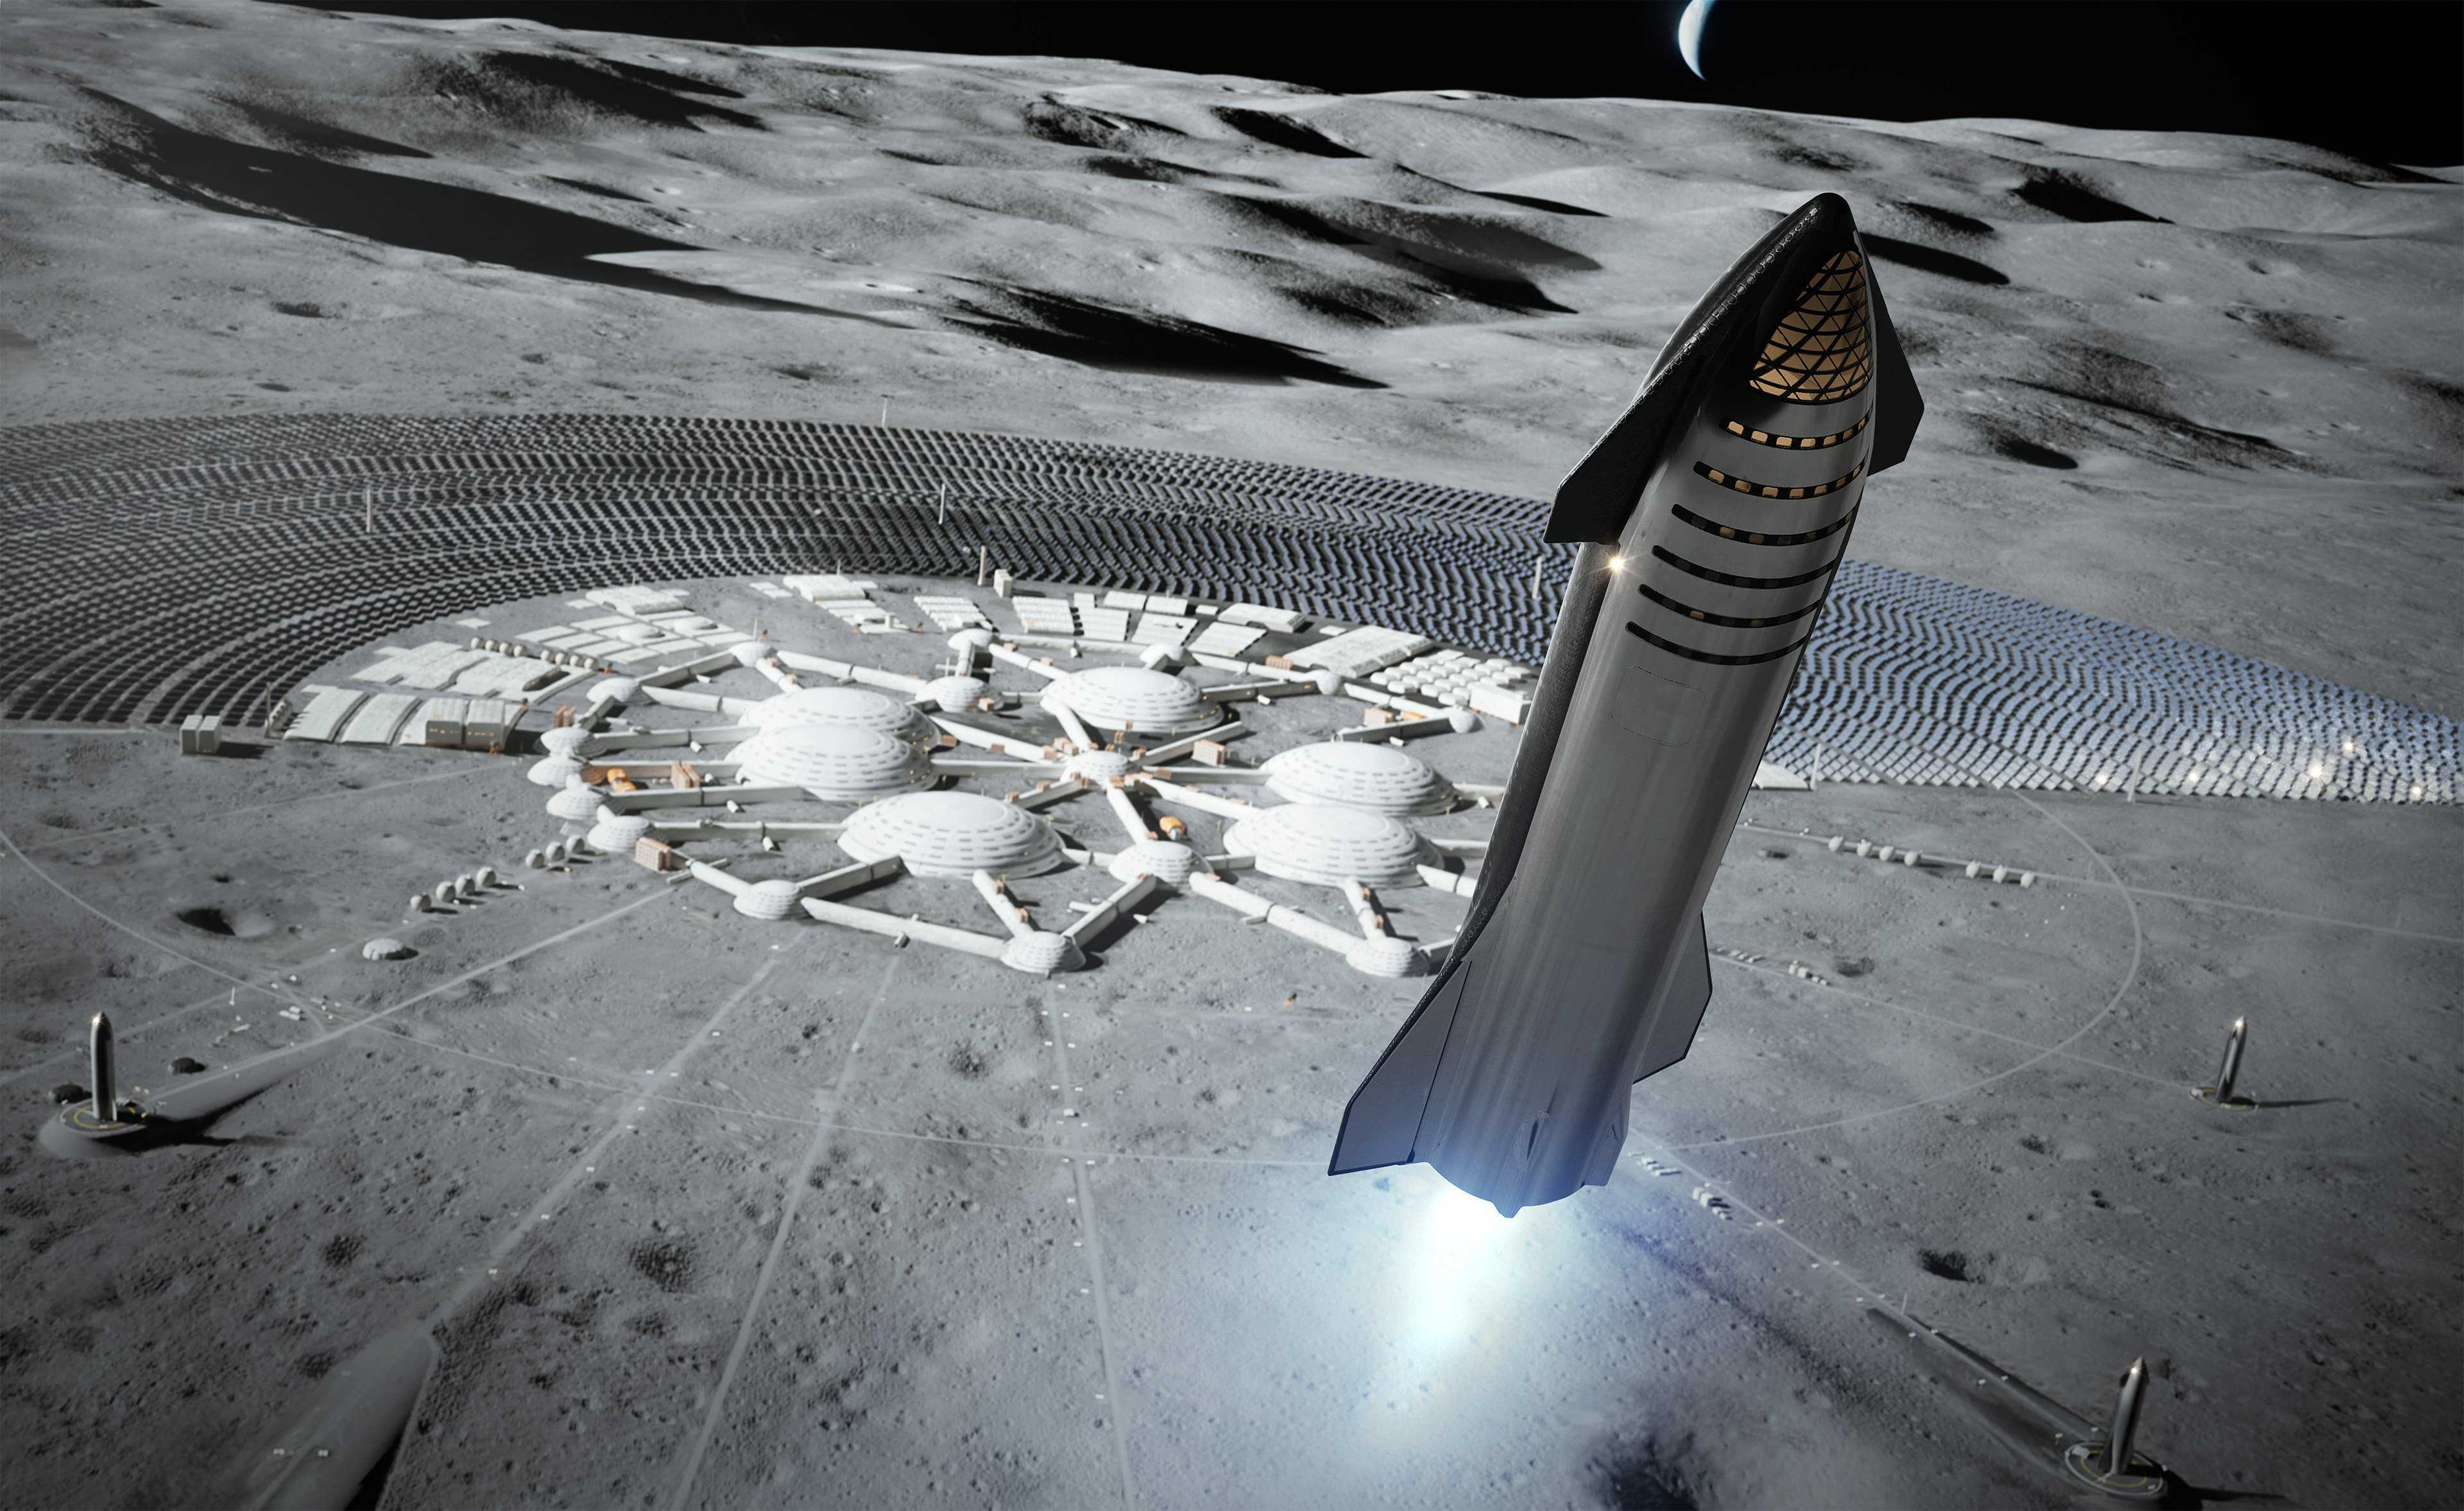 Starship 2019 Mars Moon base render (SpaceX) 1 full (c)